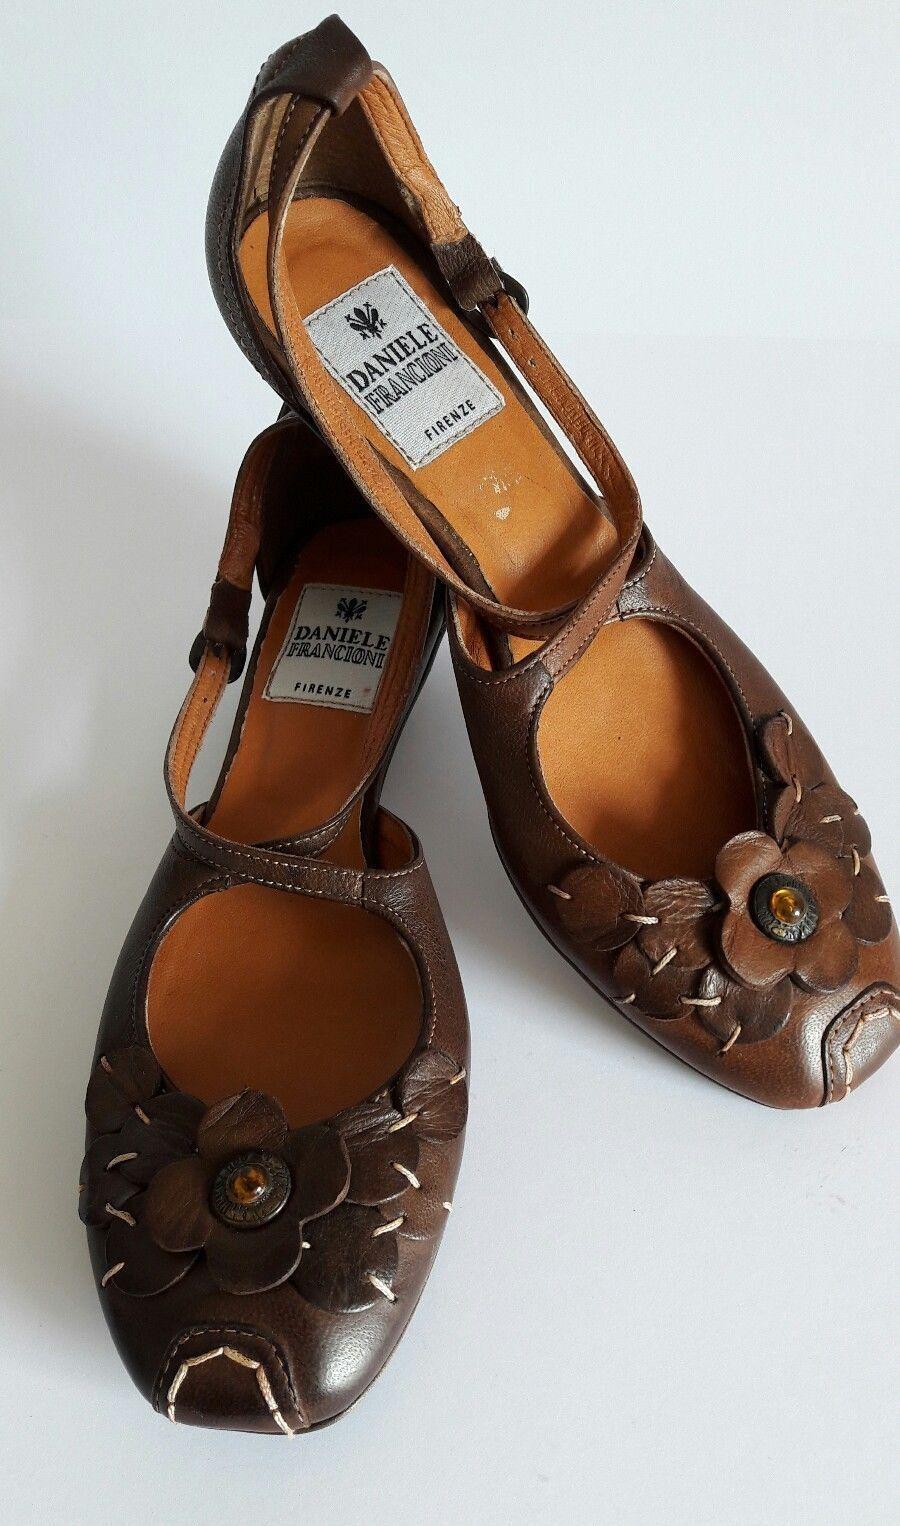 DANIELE FRANCIONI Ballerinas Pumps Schuhe LEDER Riemchen BRAUN Gr.37 NEU